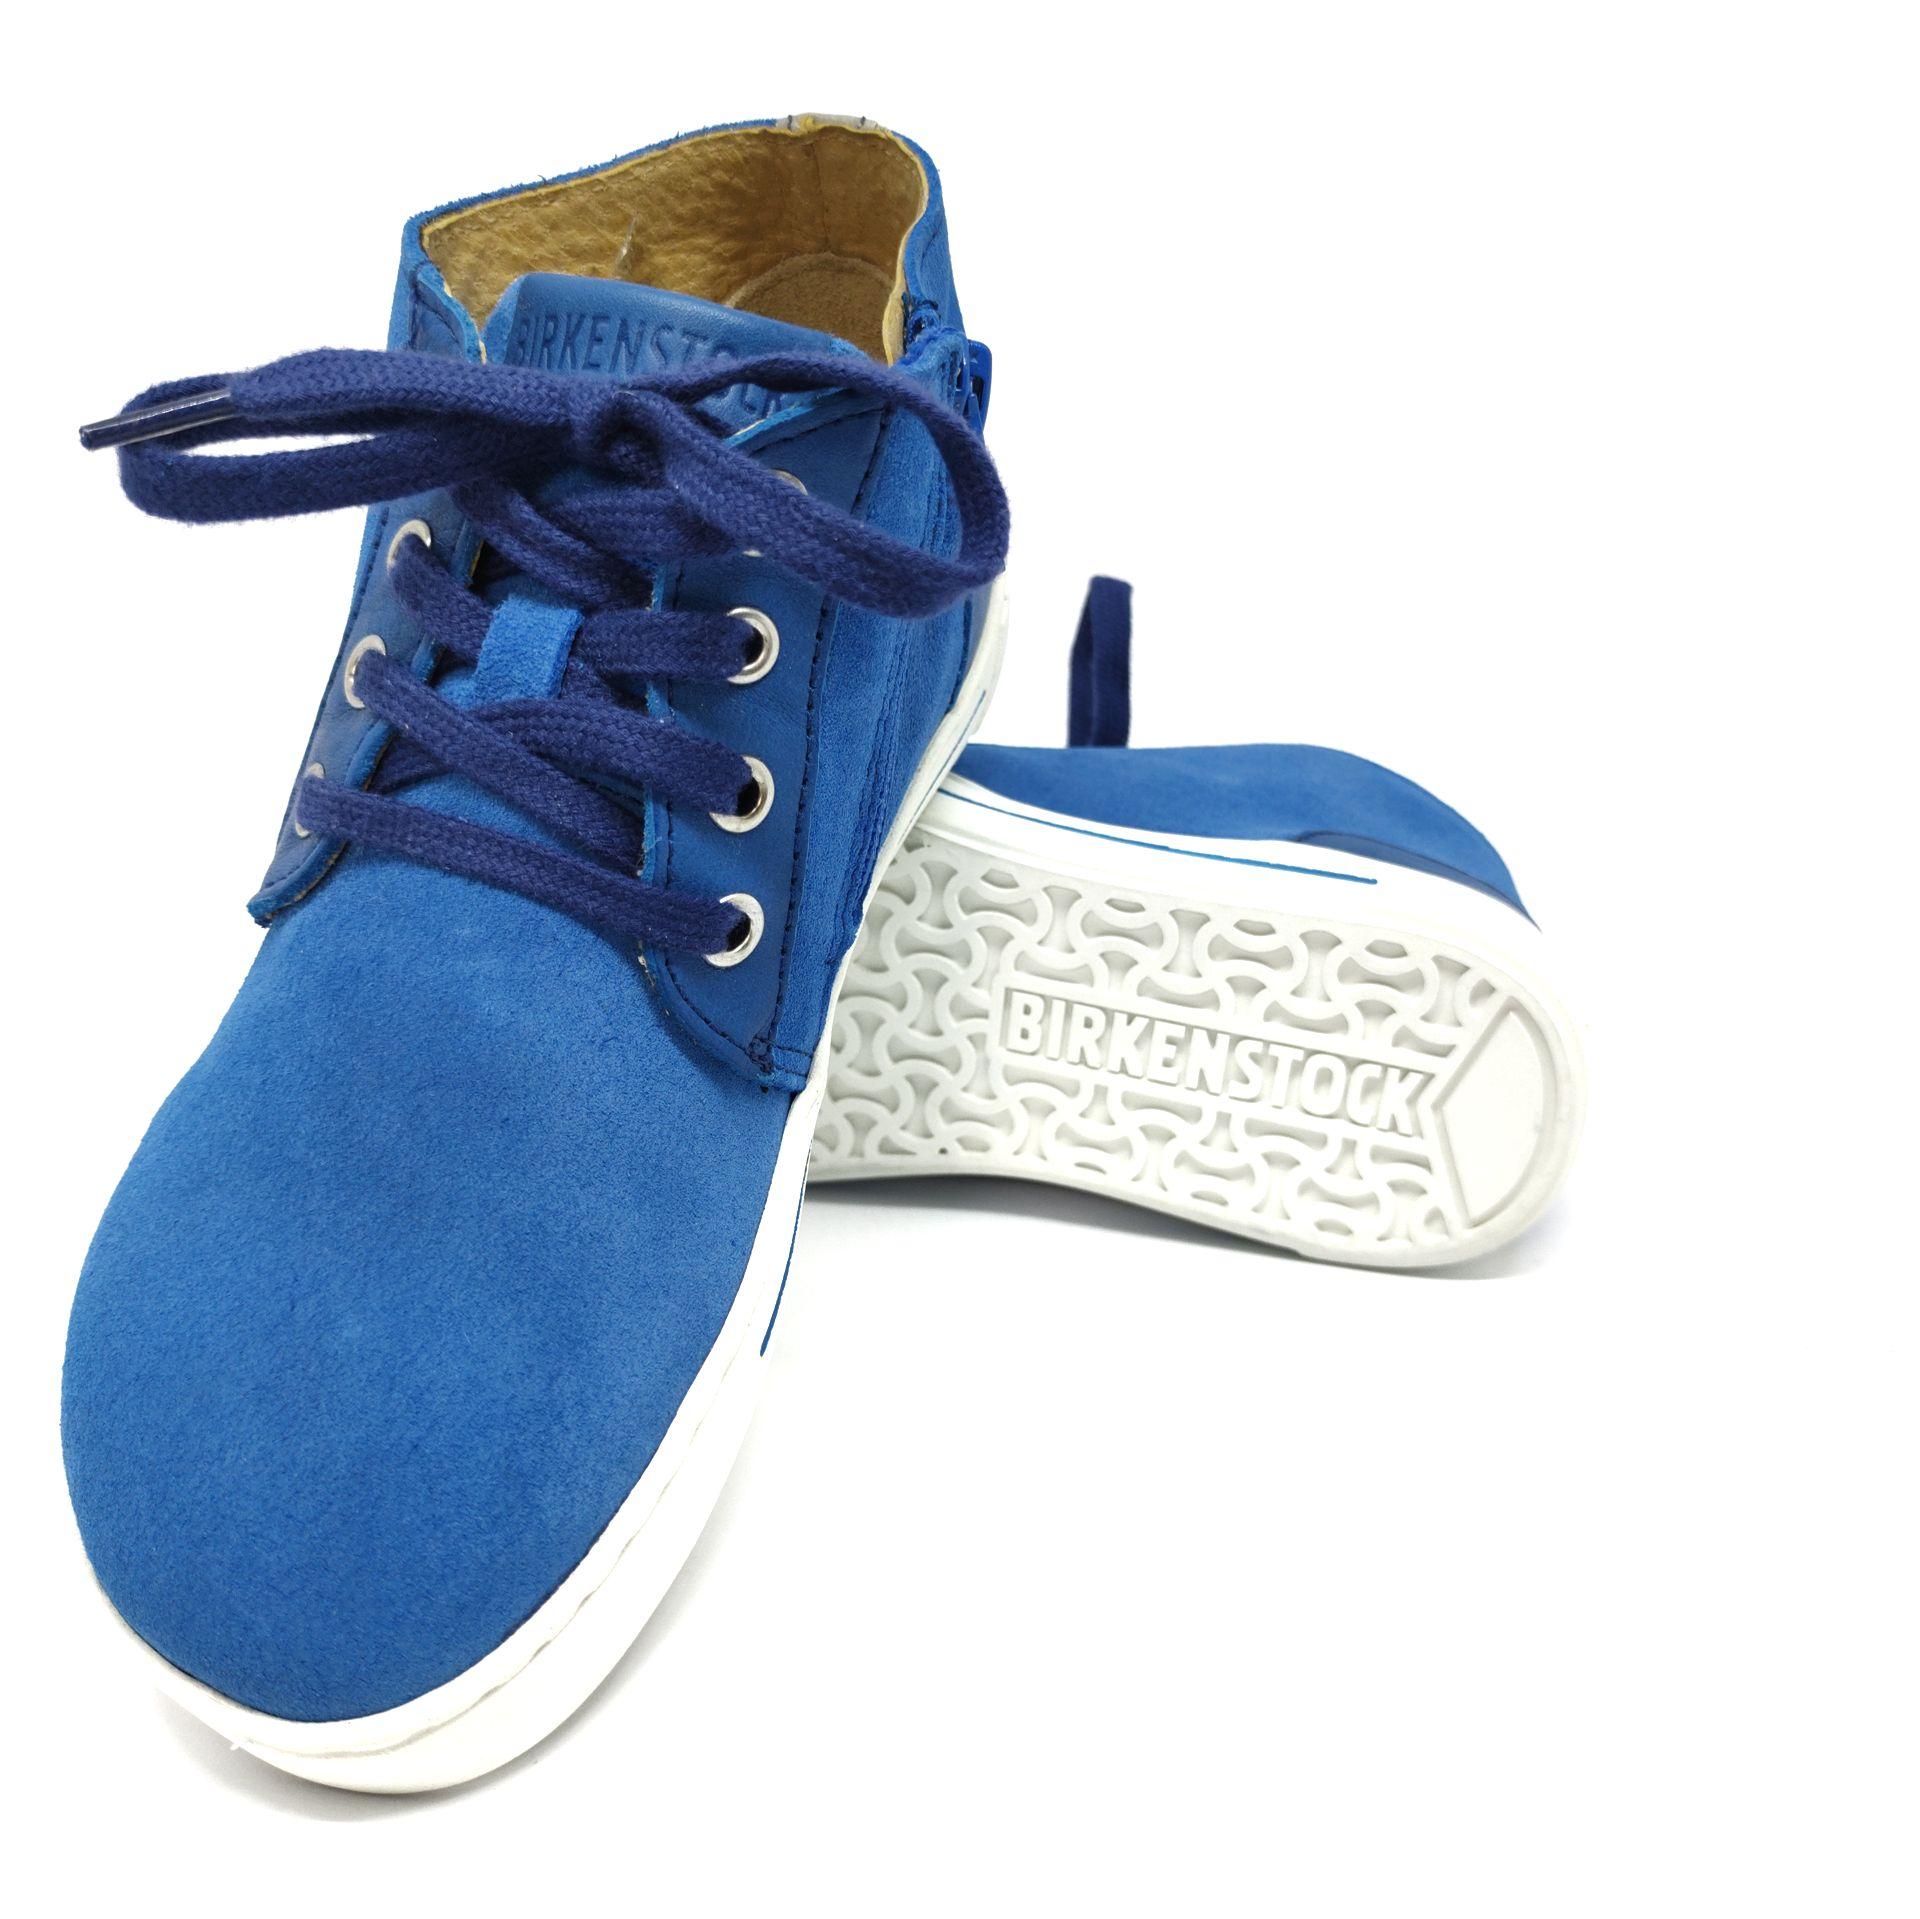 Birkenstock Prague NL/VL Blue Regular